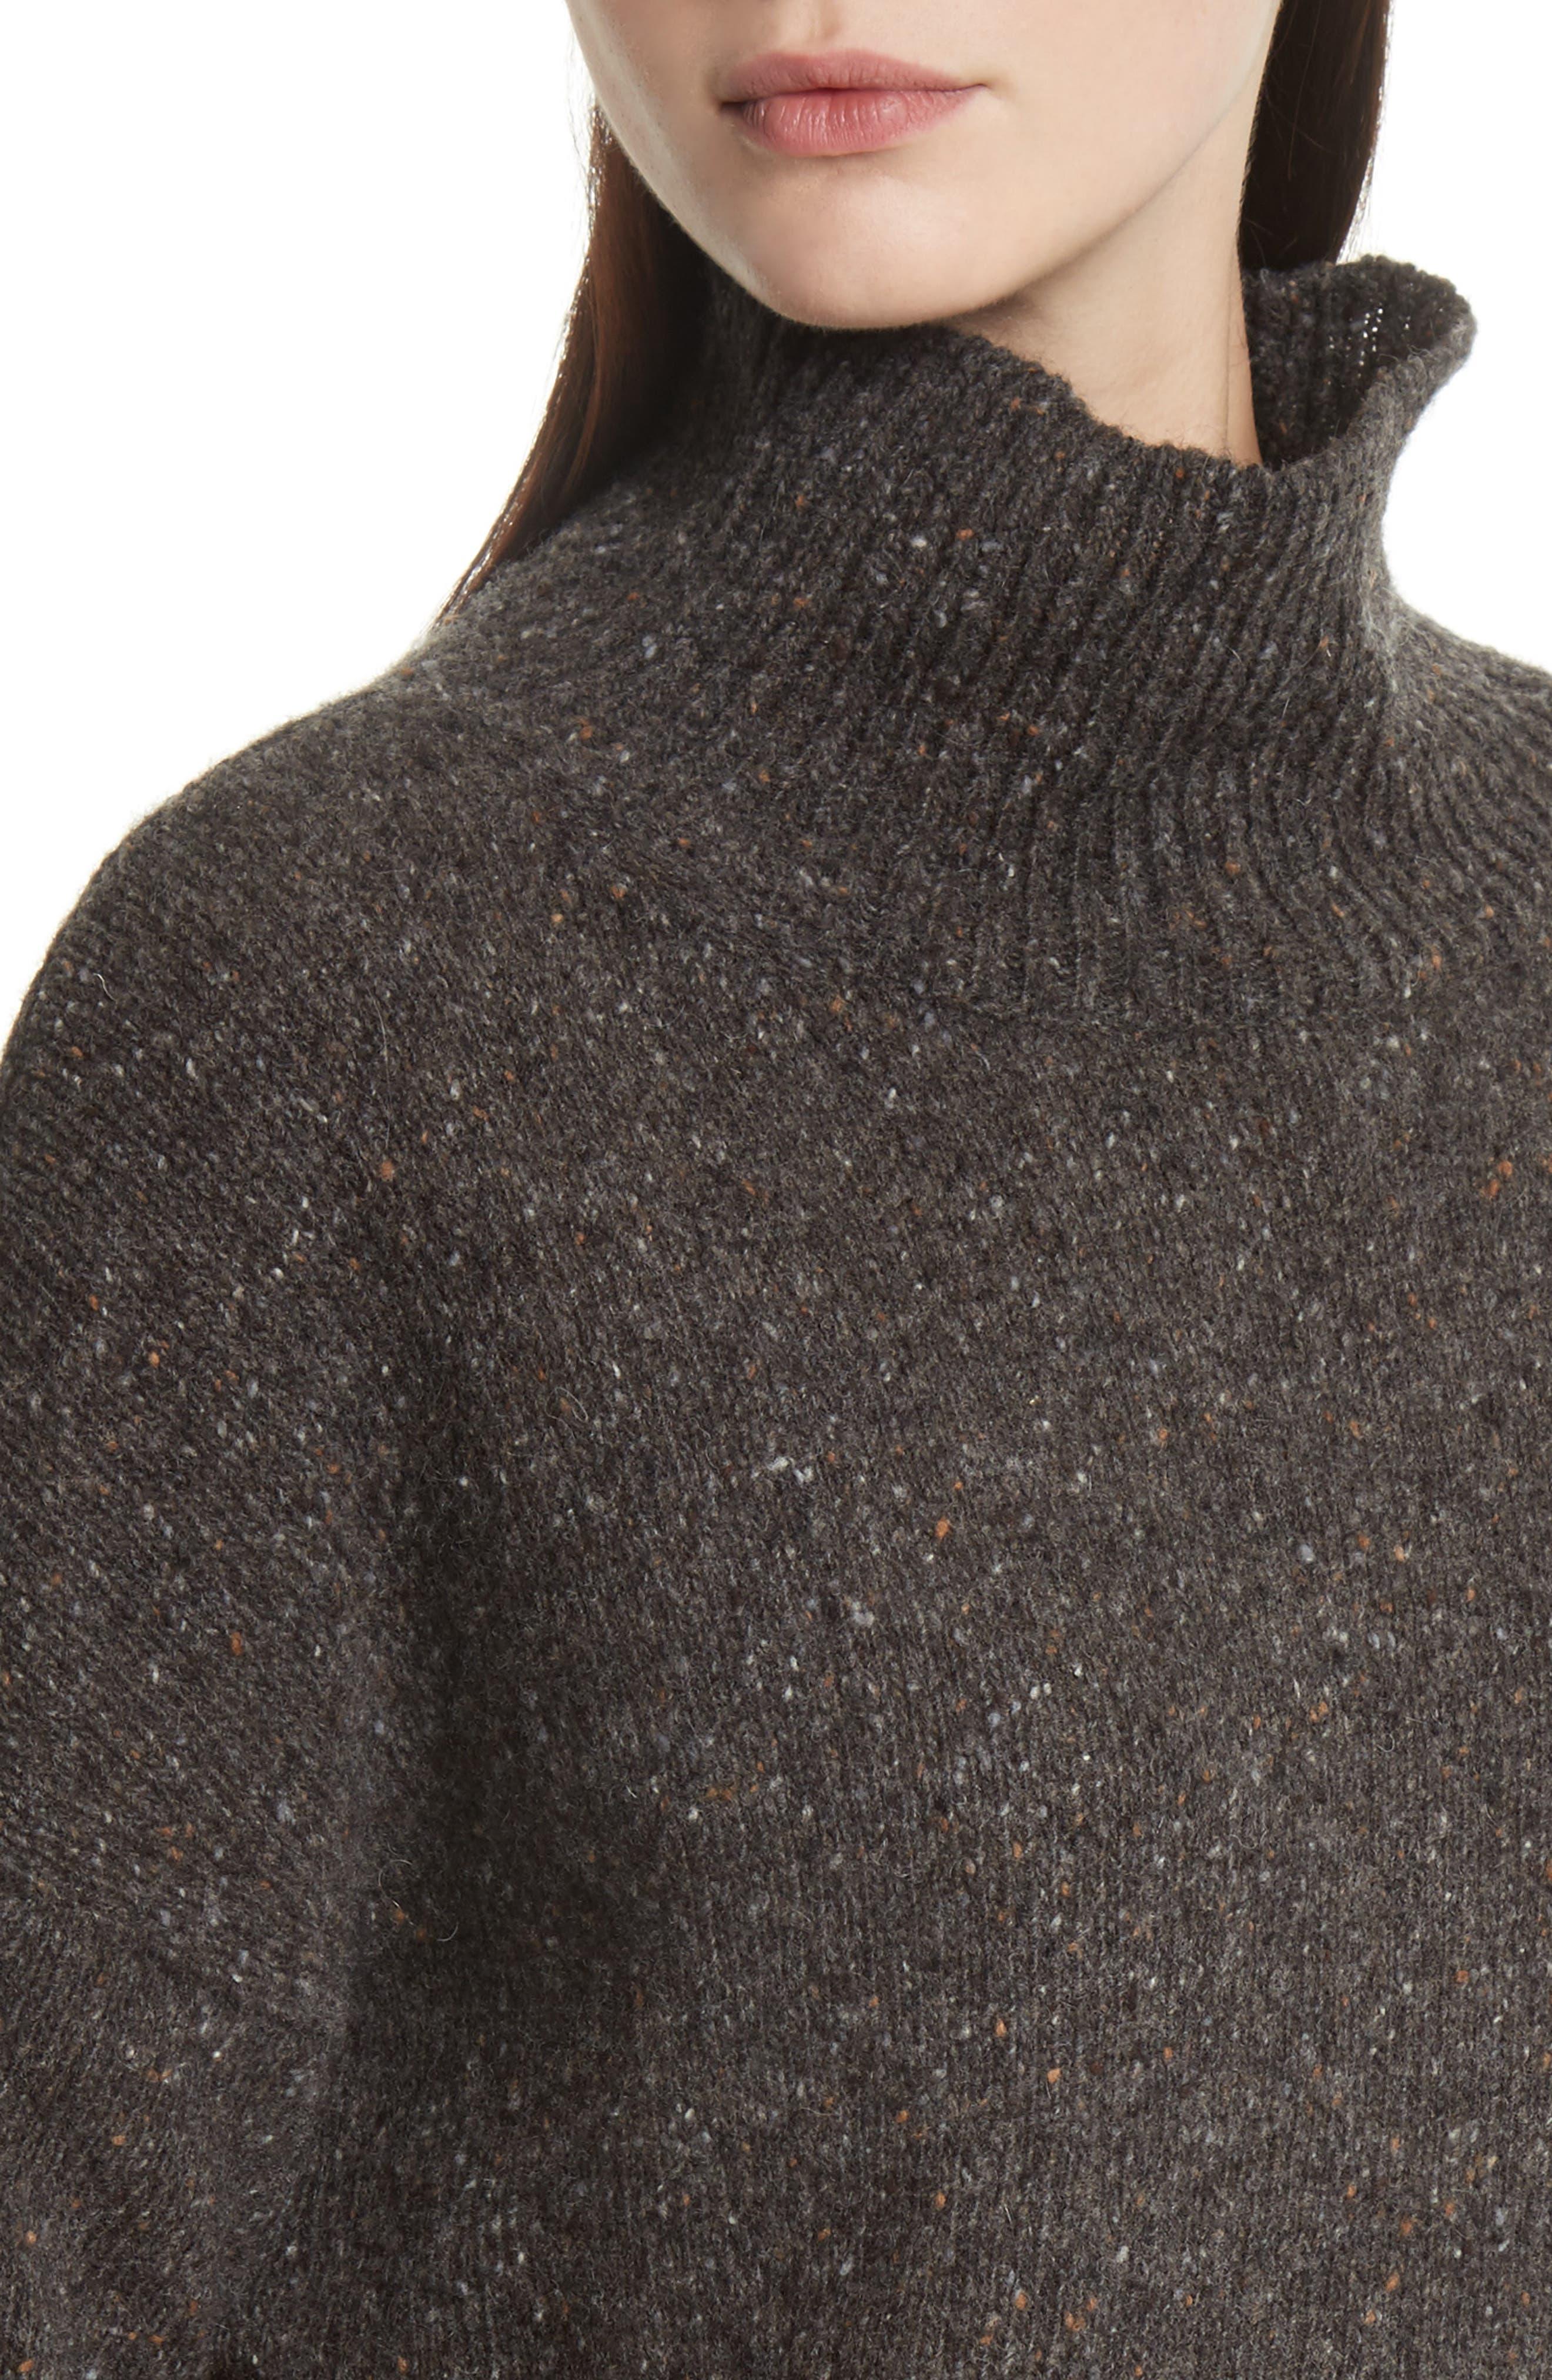 Cashmere Turtleneck Sweater,                             Alternate thumbnail 4, color,                             060